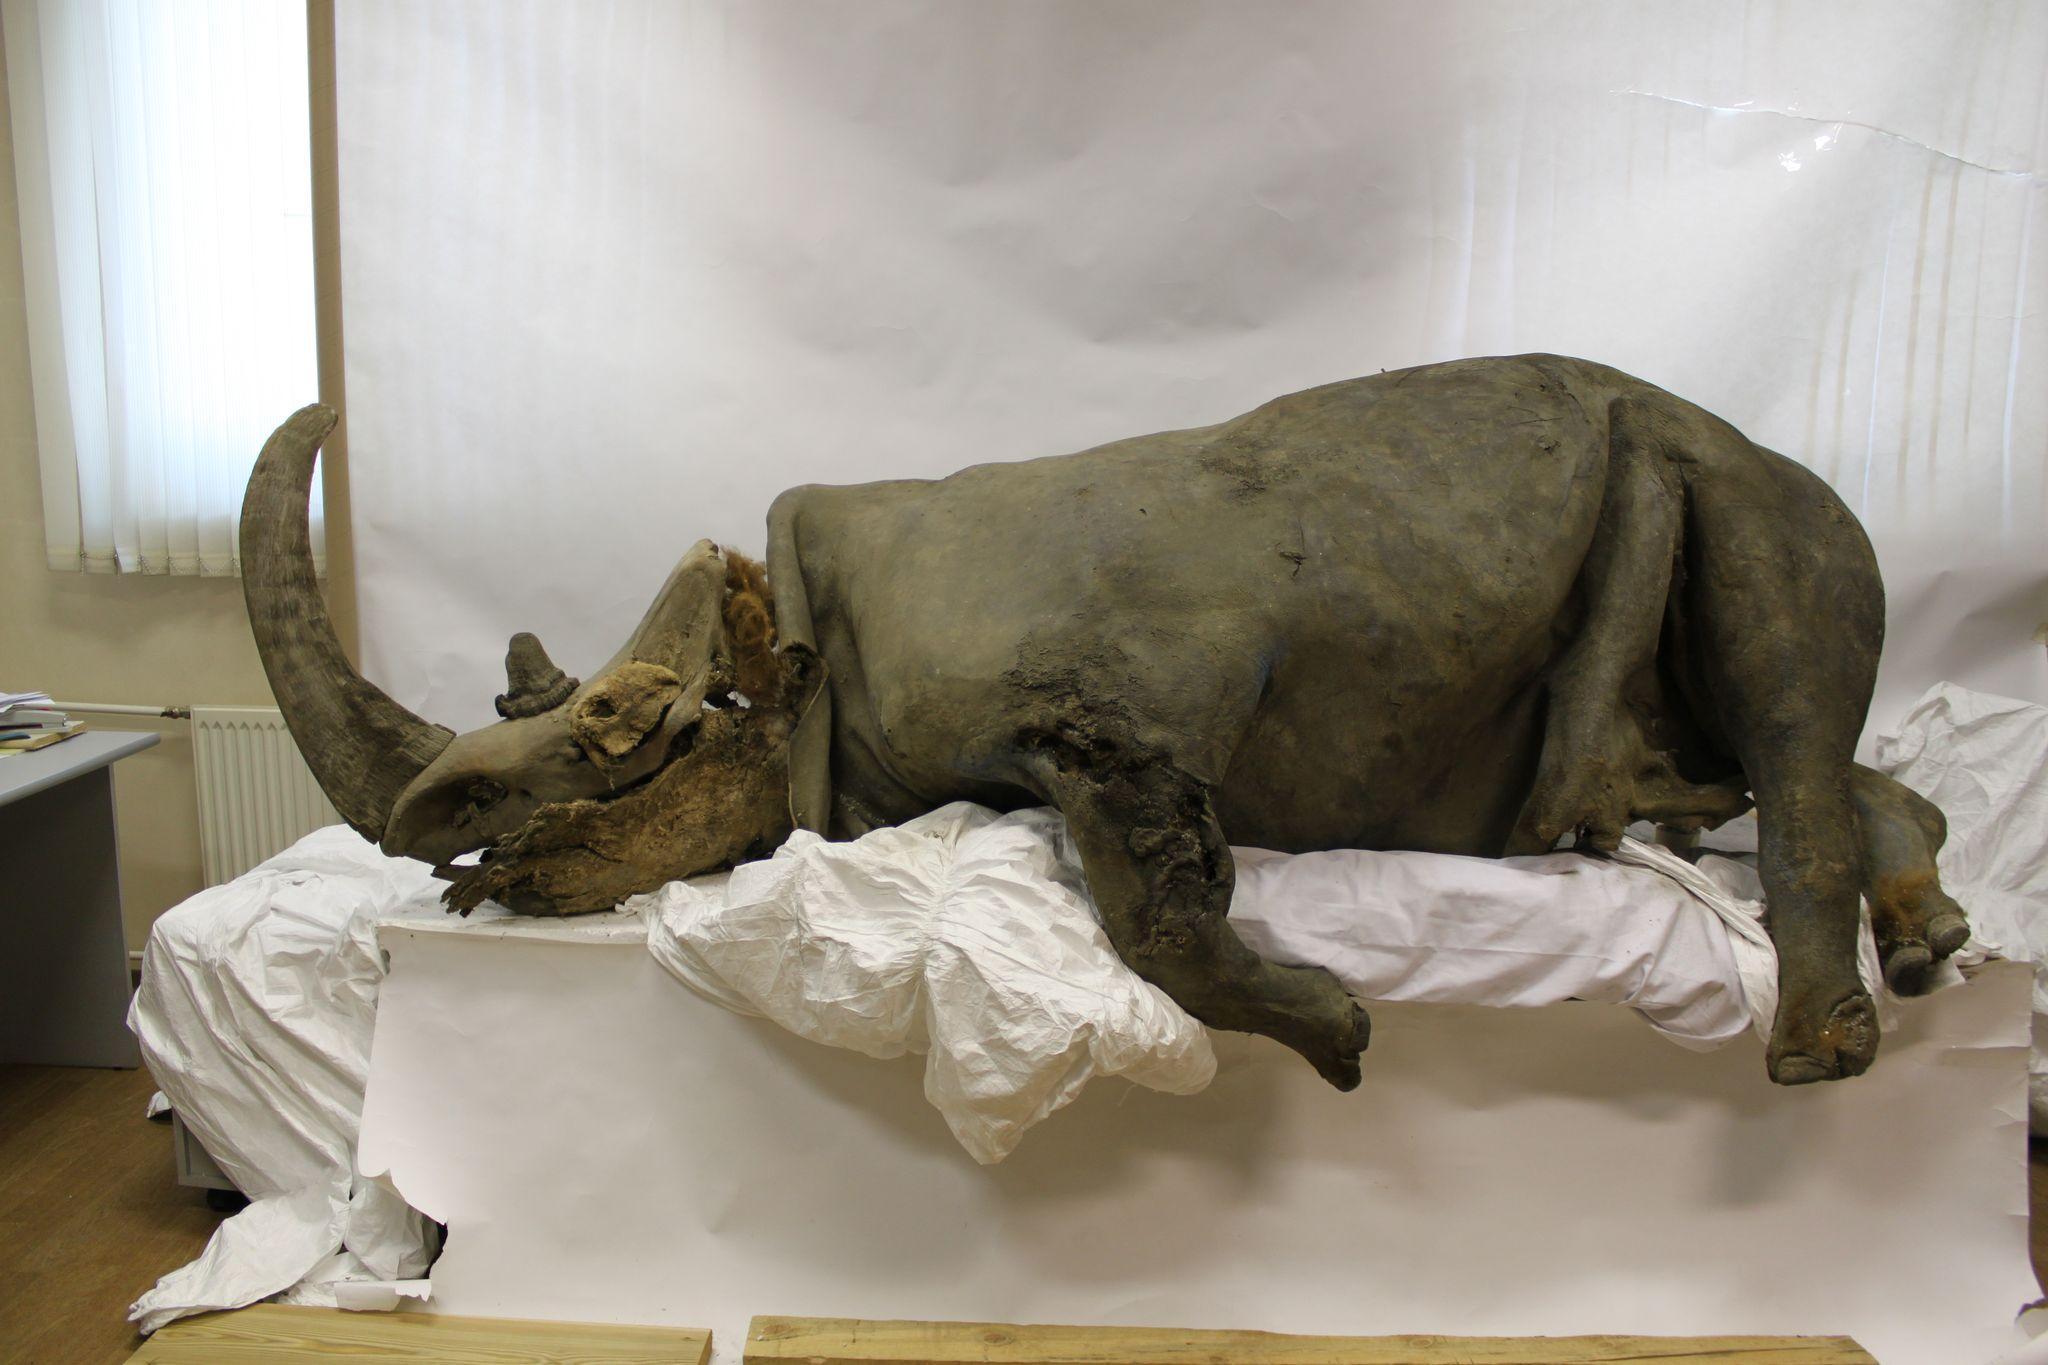 Rinoceronte lanoso. Crédito: Sergey Fedorov